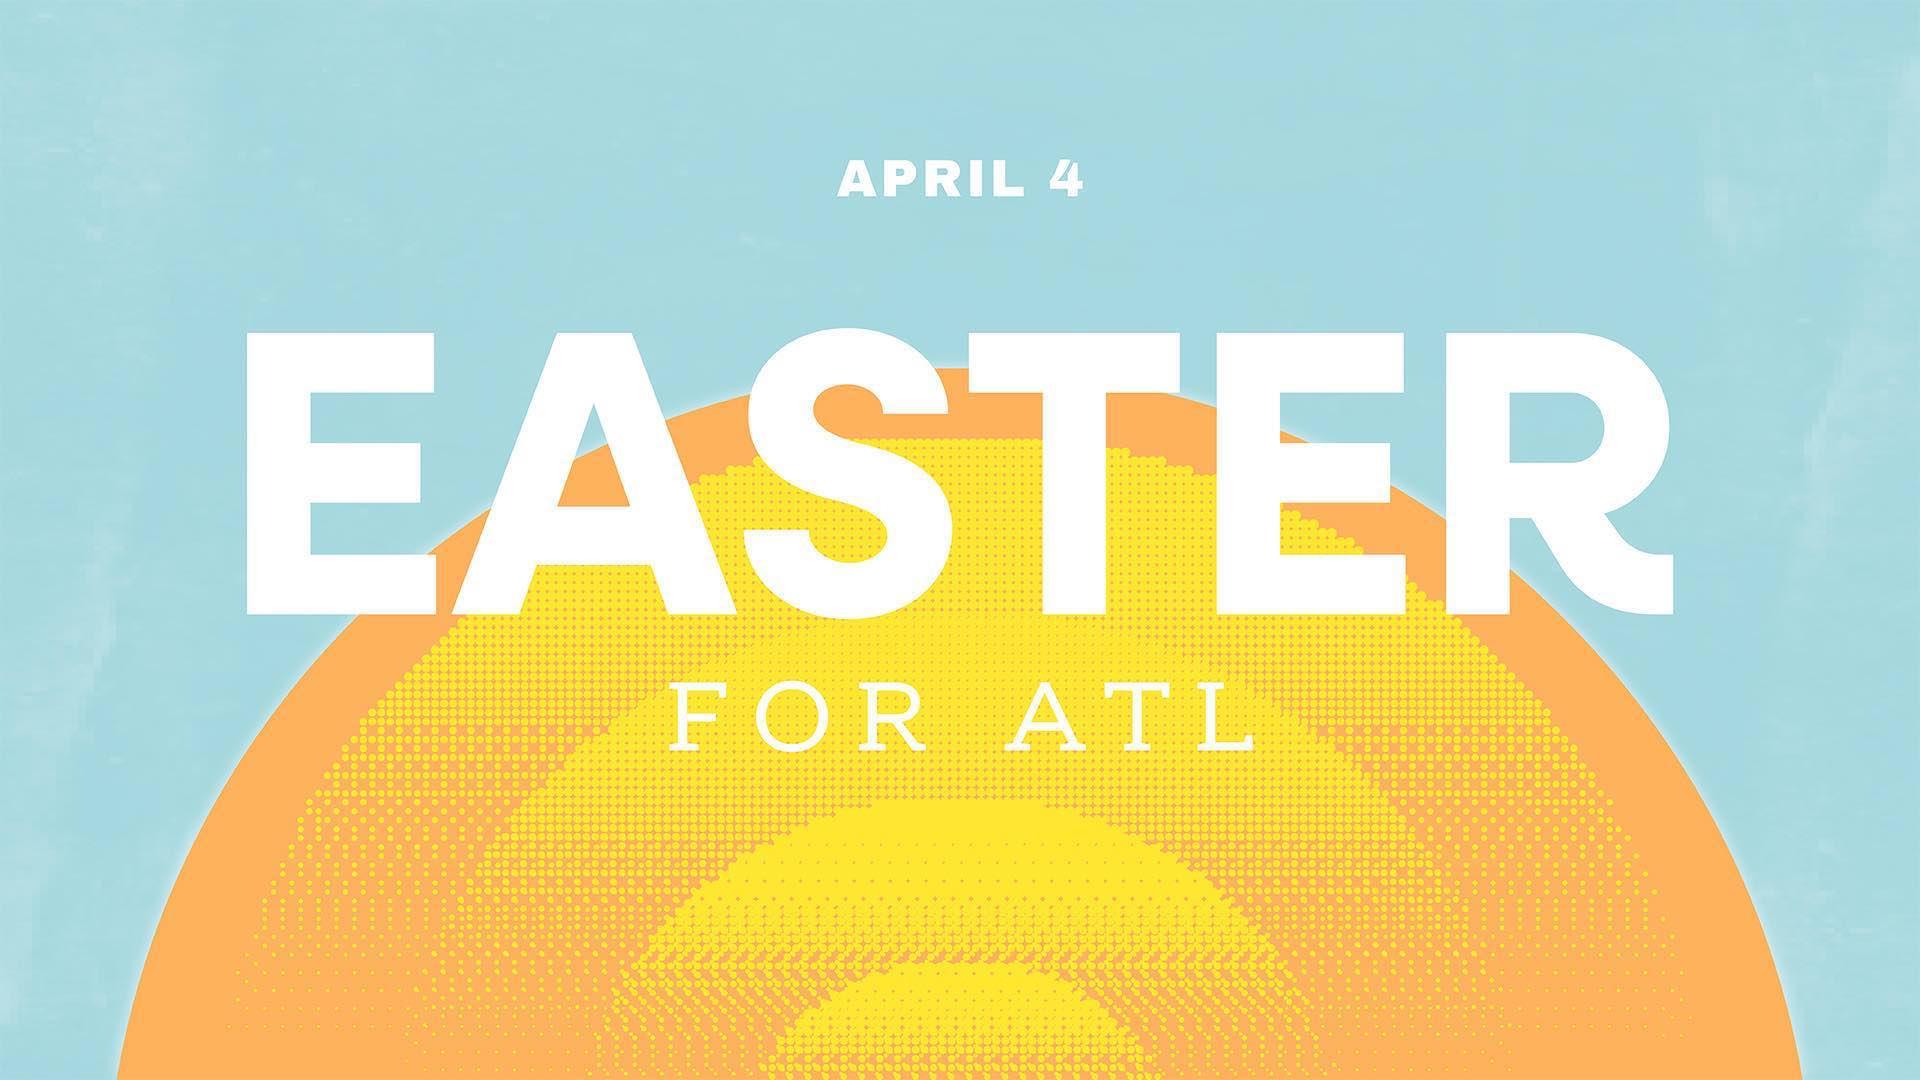 Easter FOR ATL